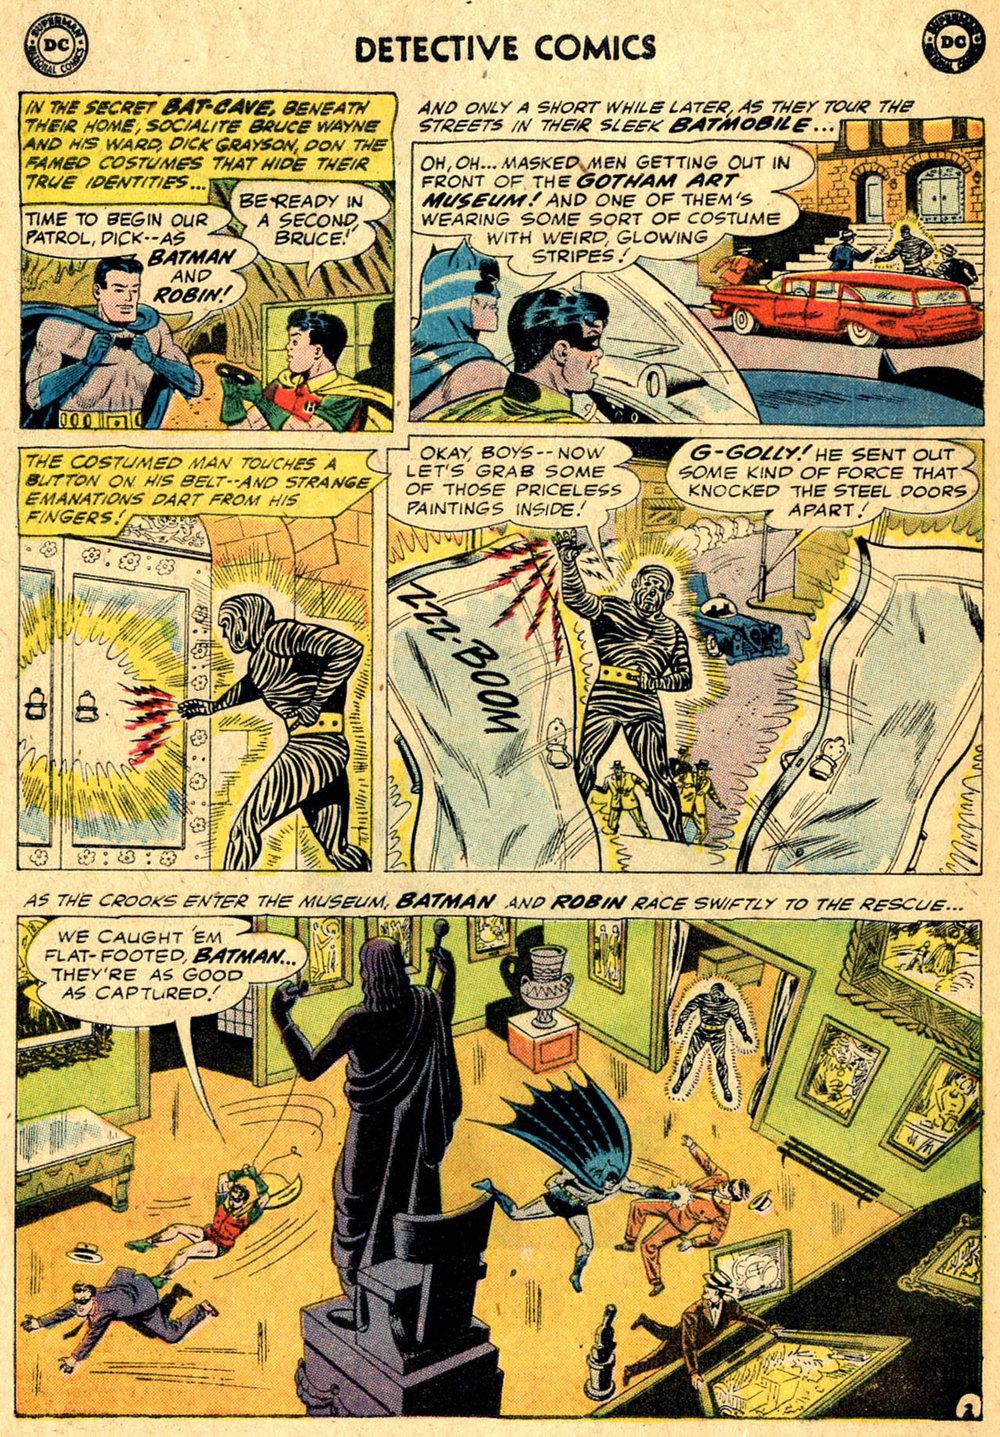 Detective Comics (1937) 275 4.jpg